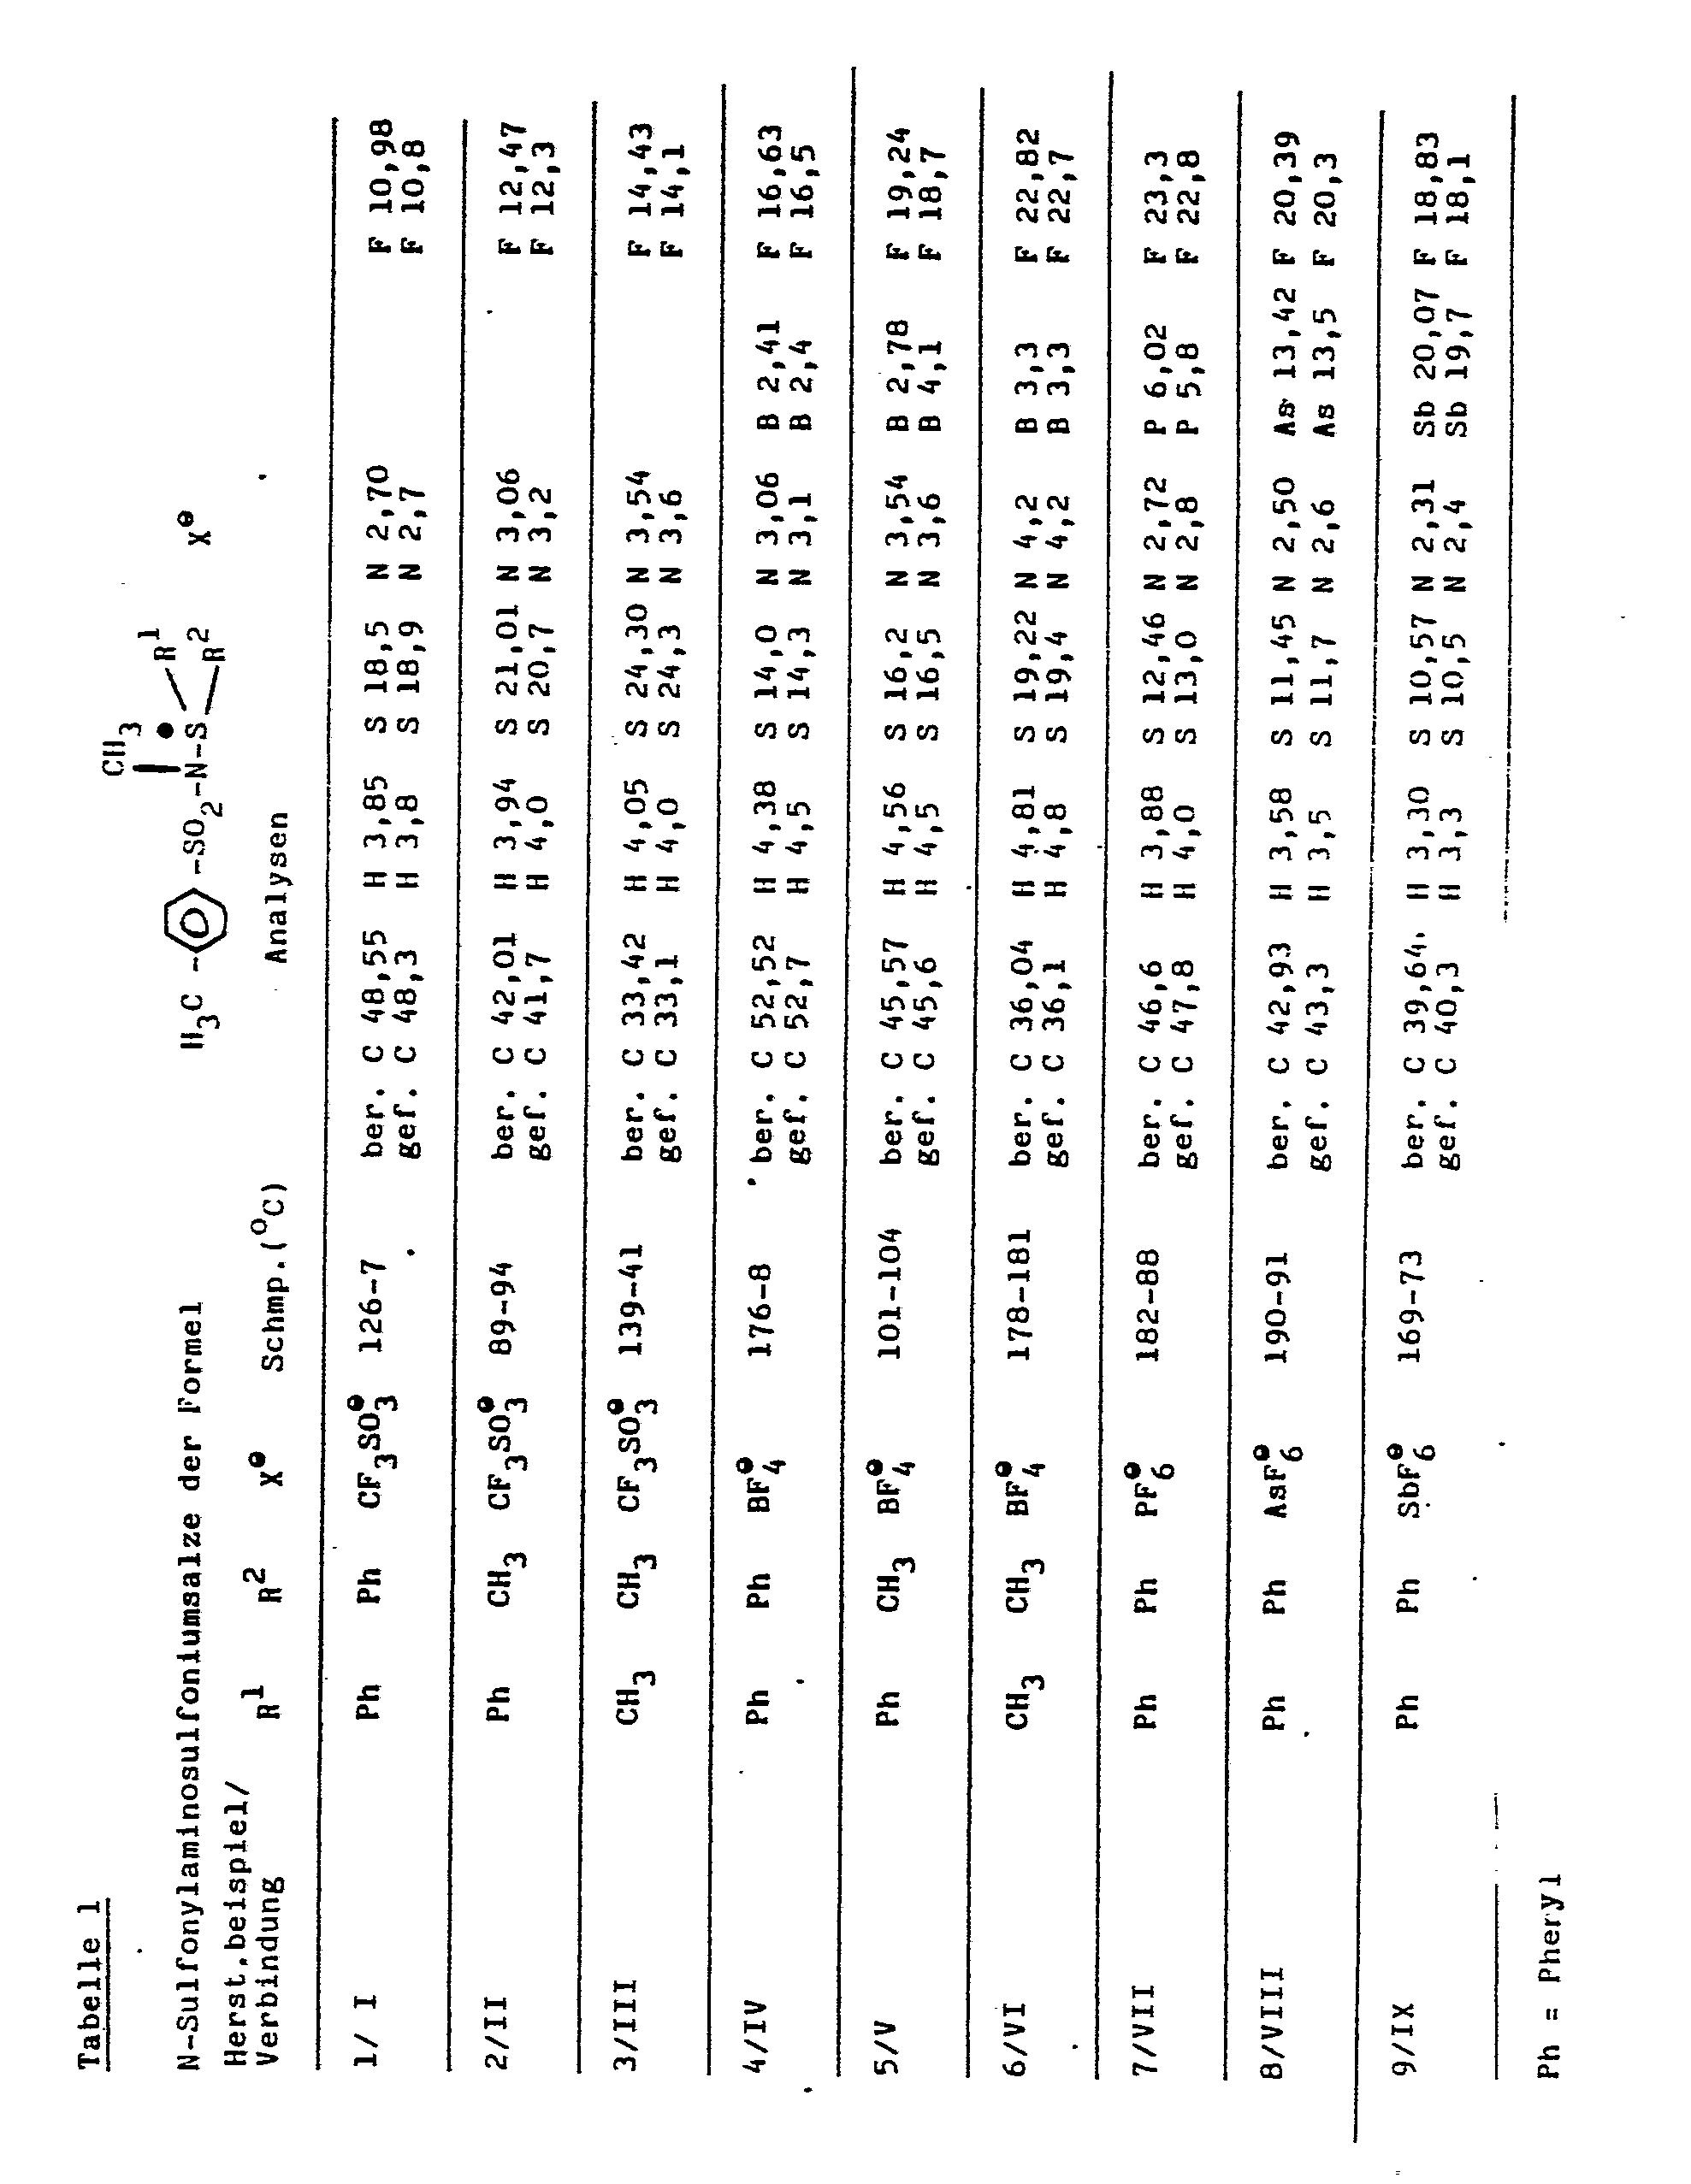 dimethylsulfat wurden